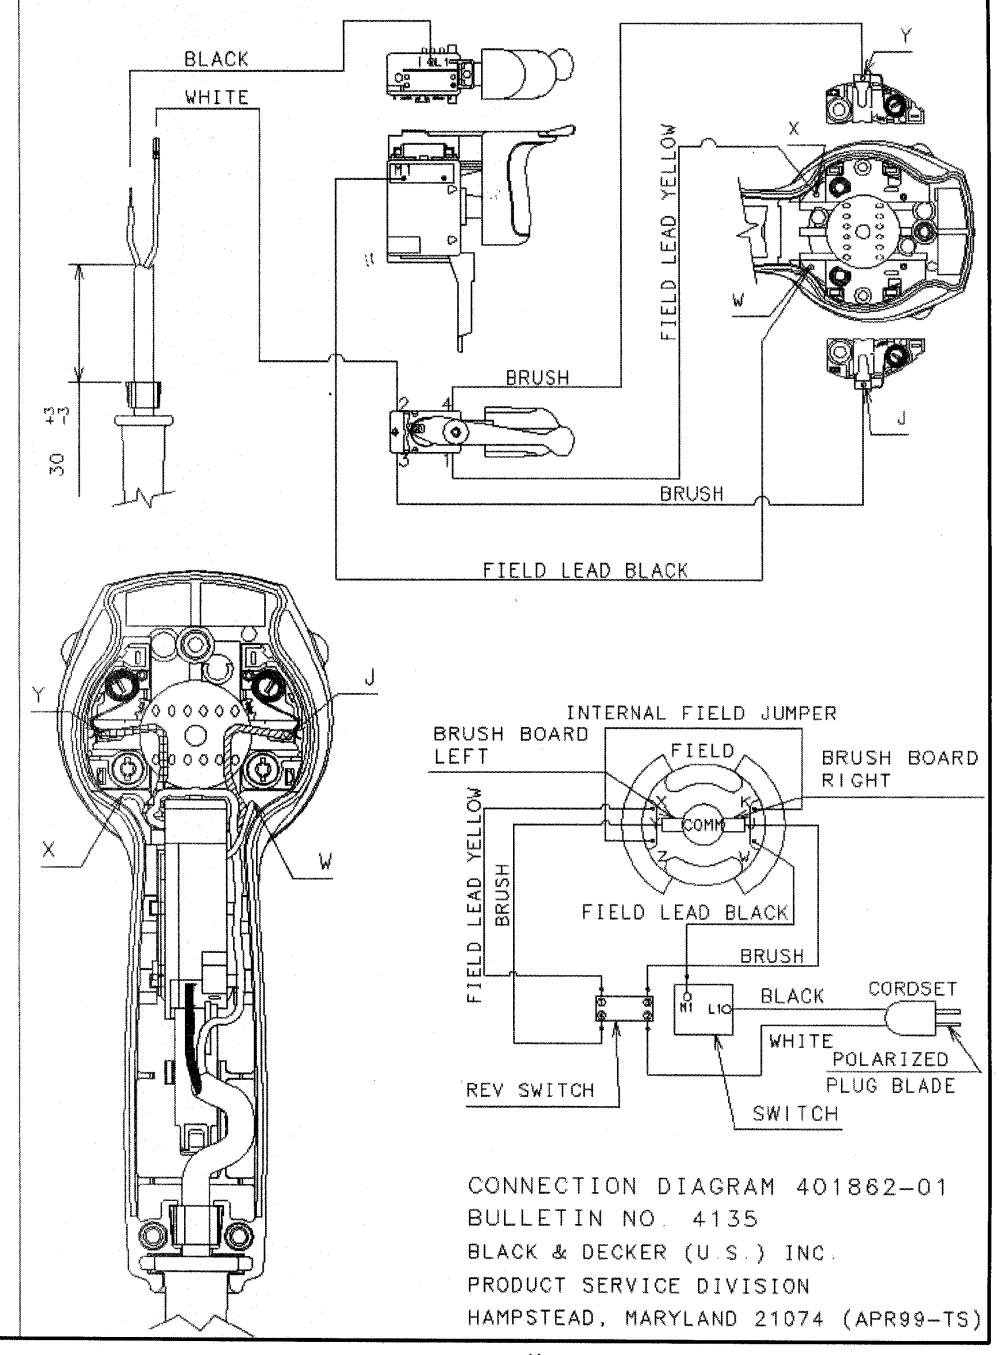 medium resolution of dewalt dg6300b wiring diagram wiring diagram passdewalt dg6300b wiring diagram wiring diagram forward dewalt dg6300b wiring